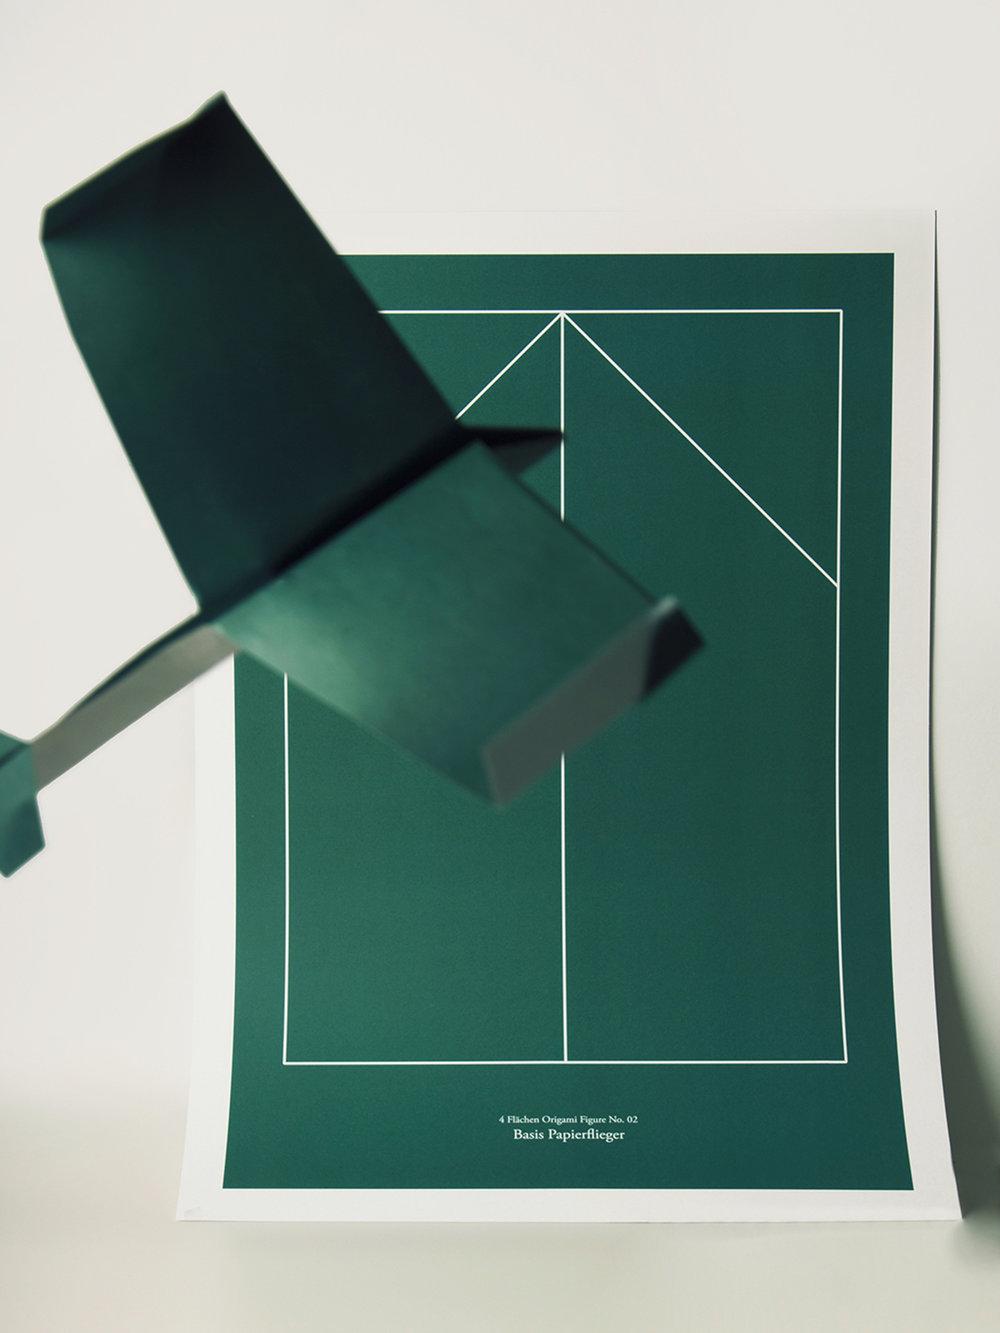 Origami Figur Papierflieger mit passendem Print  Origami figure Paper airplane with adequate print